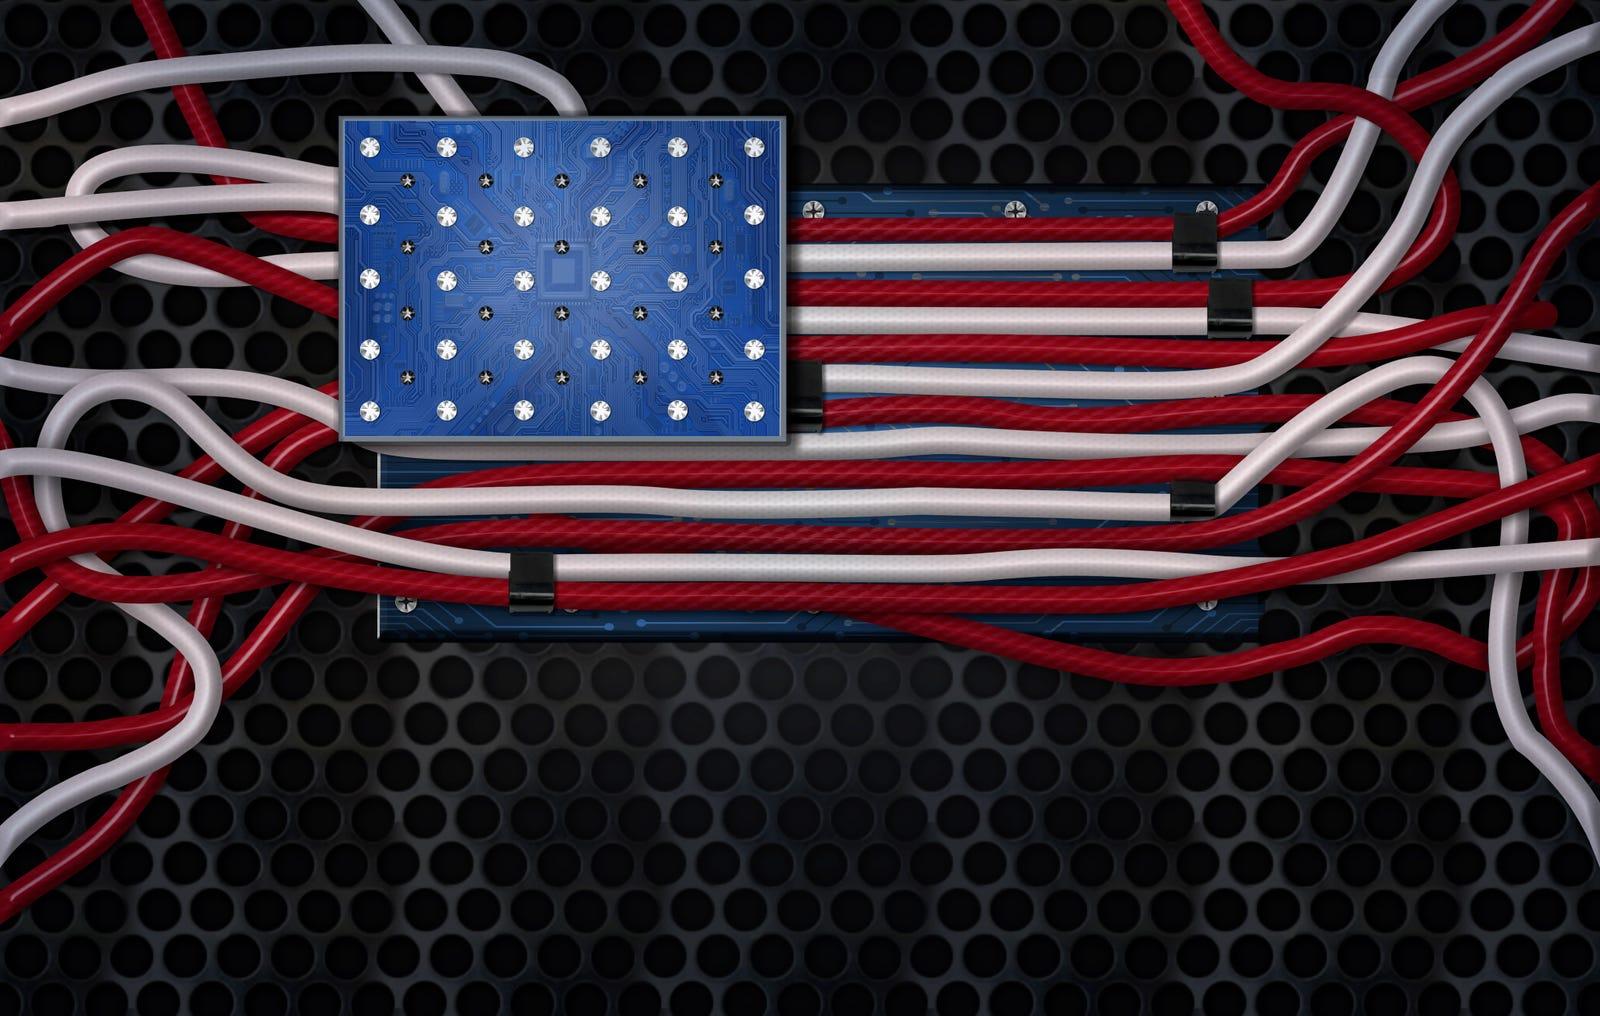 https://www.gannett-cdn.com/indepth-static-assets/uploads/master/7831763002/c0d0afd4-5dad-4c54-9f5d-460ac3cc4546-broadband3.jpg